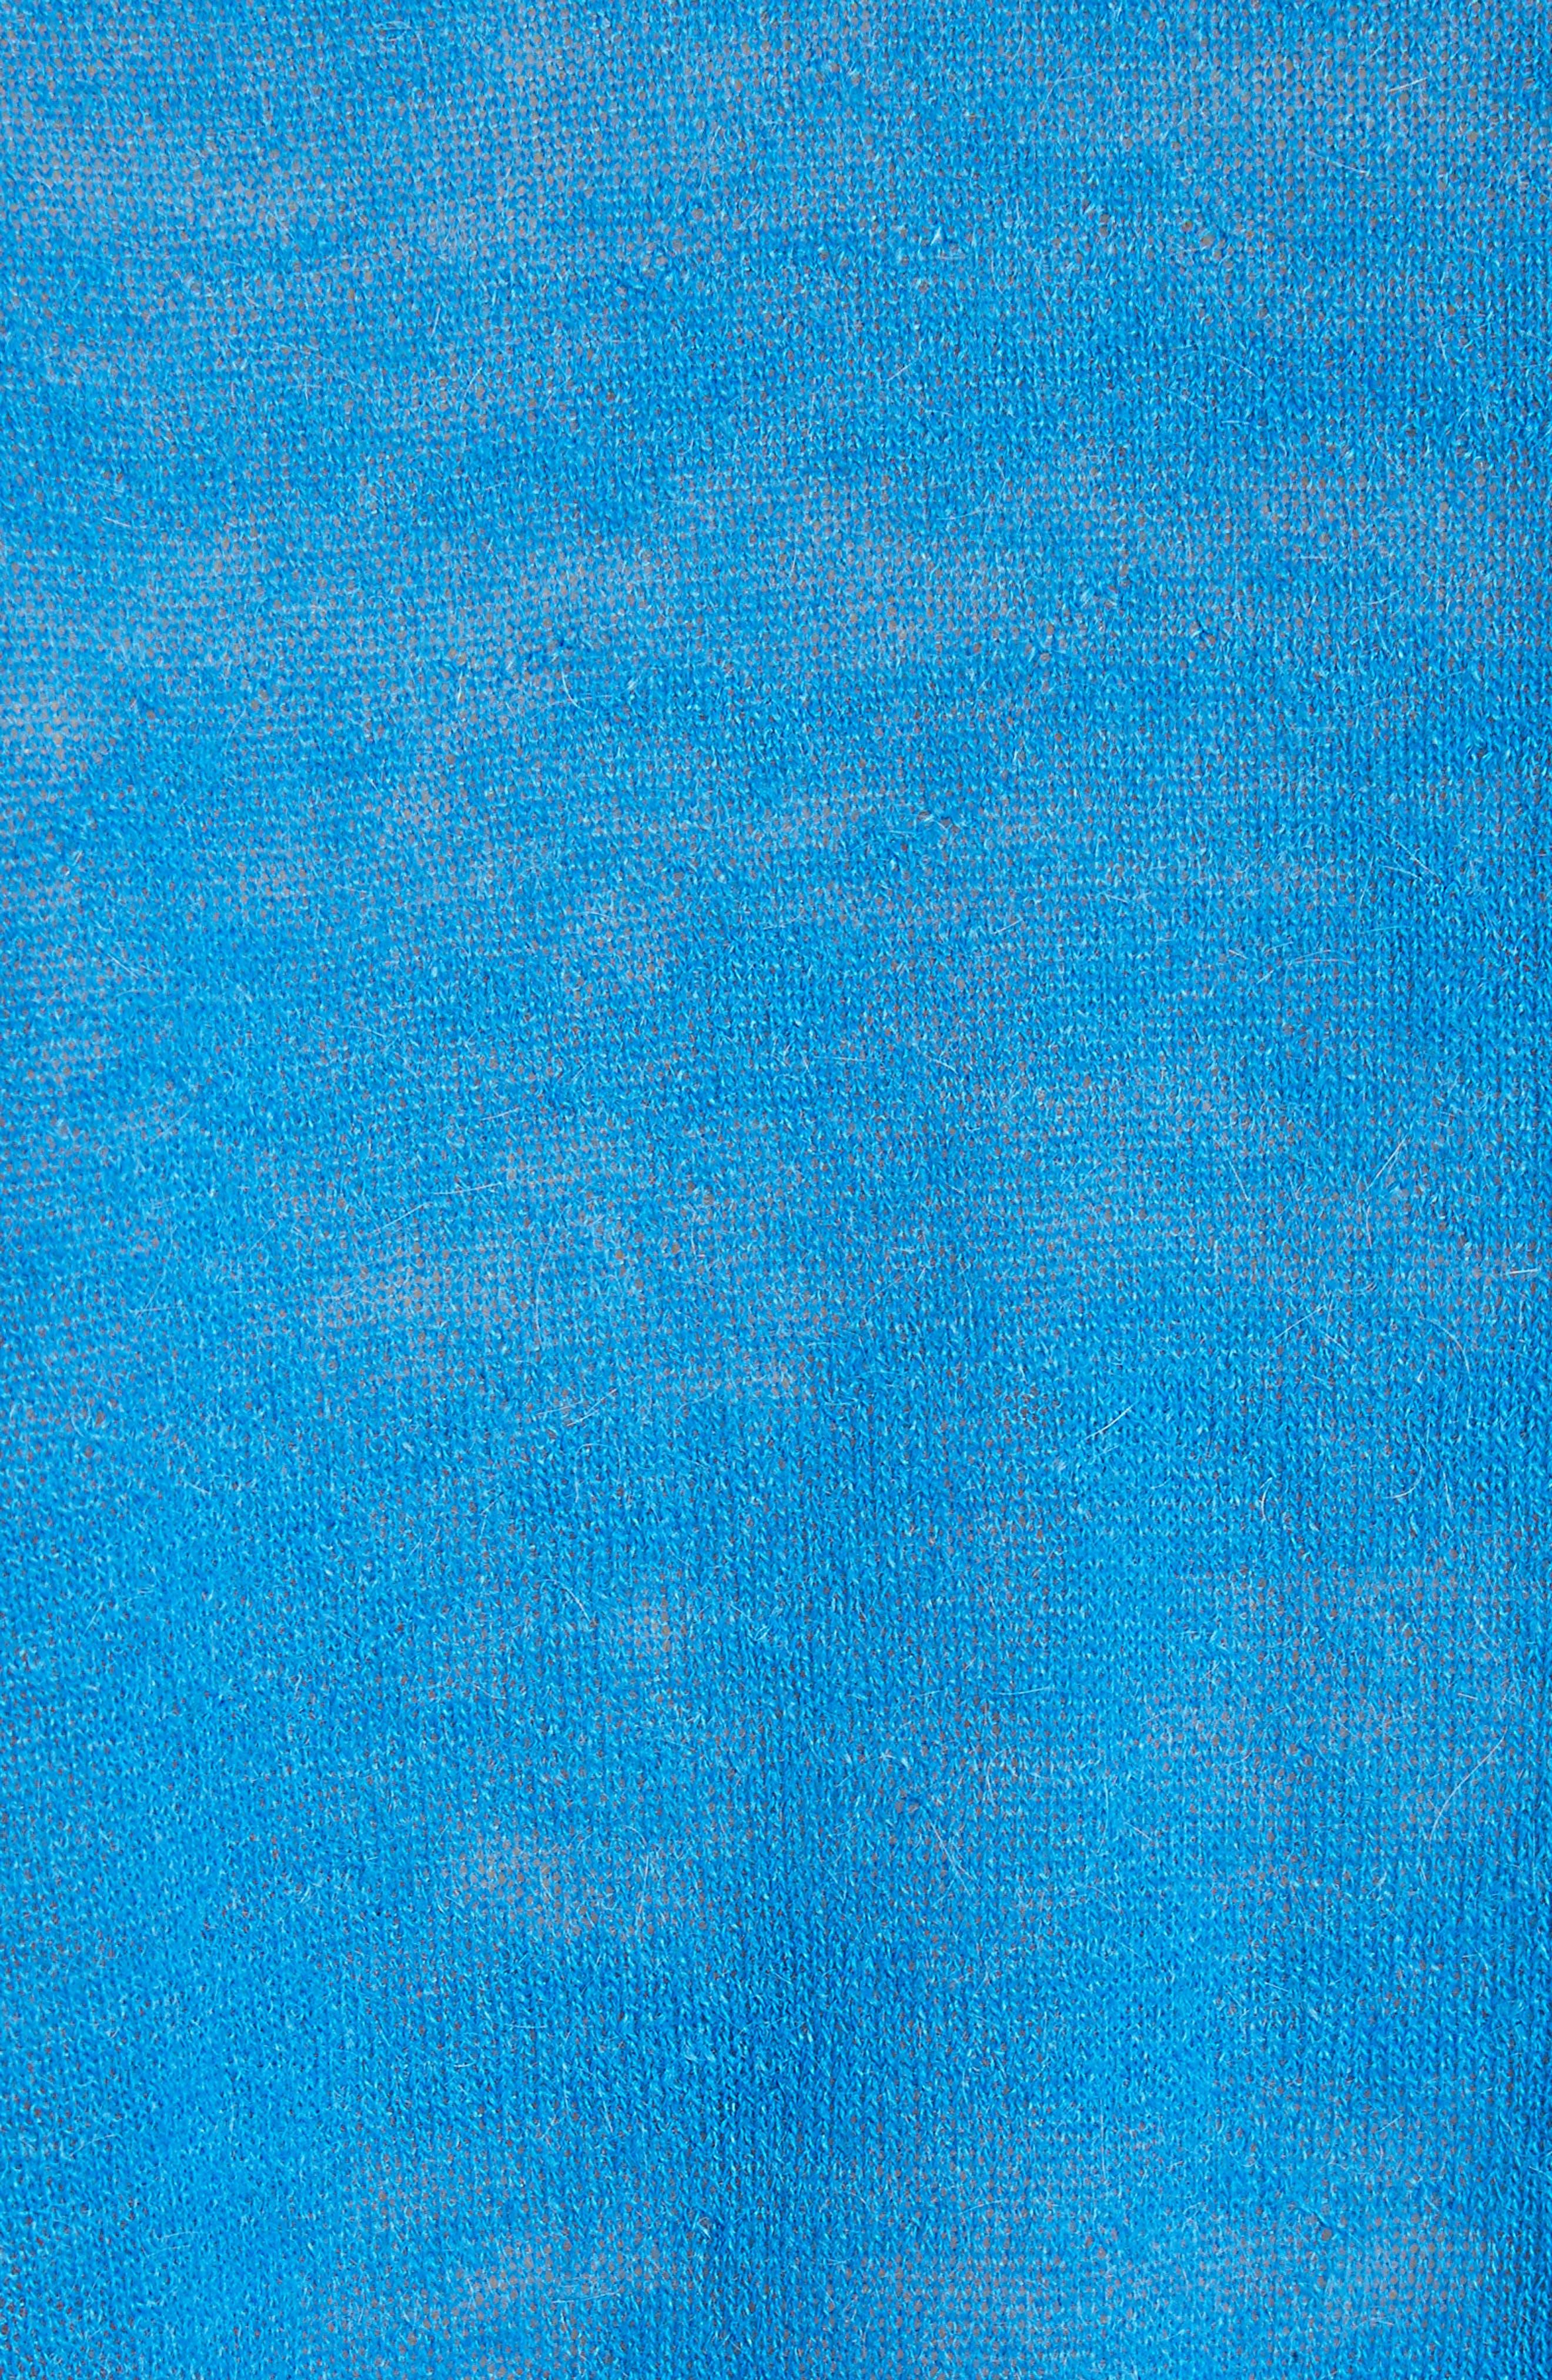 Isabel Marant Étoile Wool & Alpaca Blend Sweater,                             Alternate thumbnail 5, color,